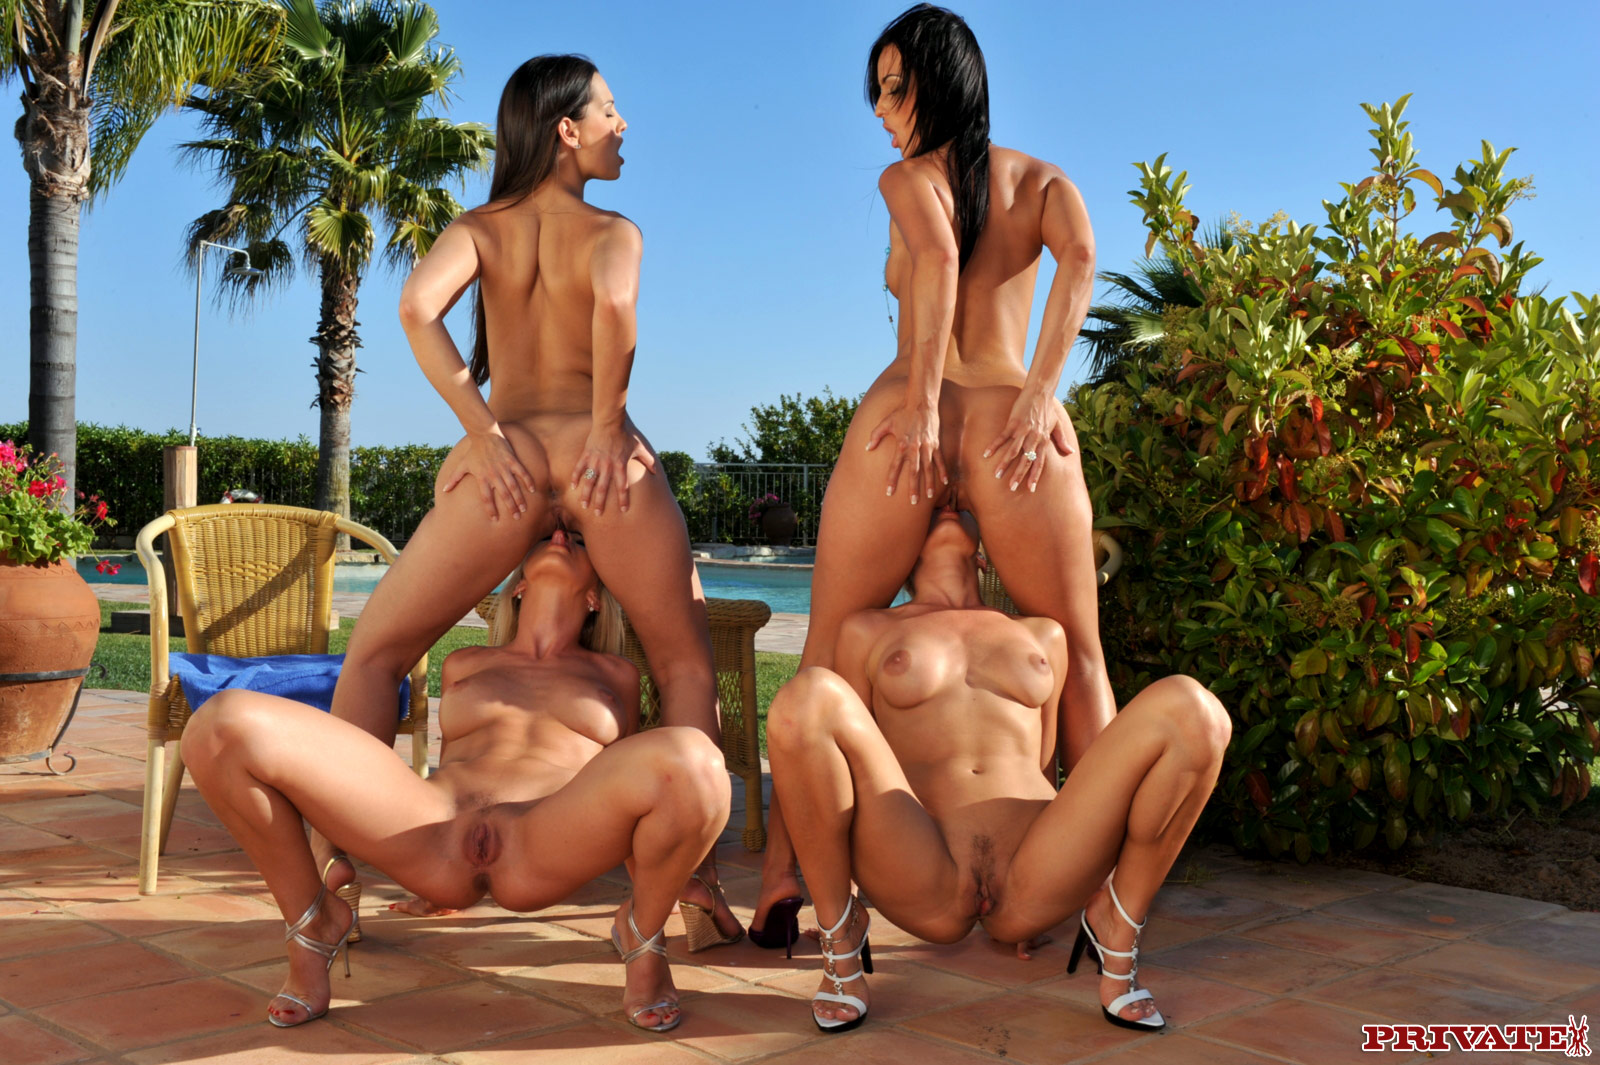 Lesbian sex styles pics naked film